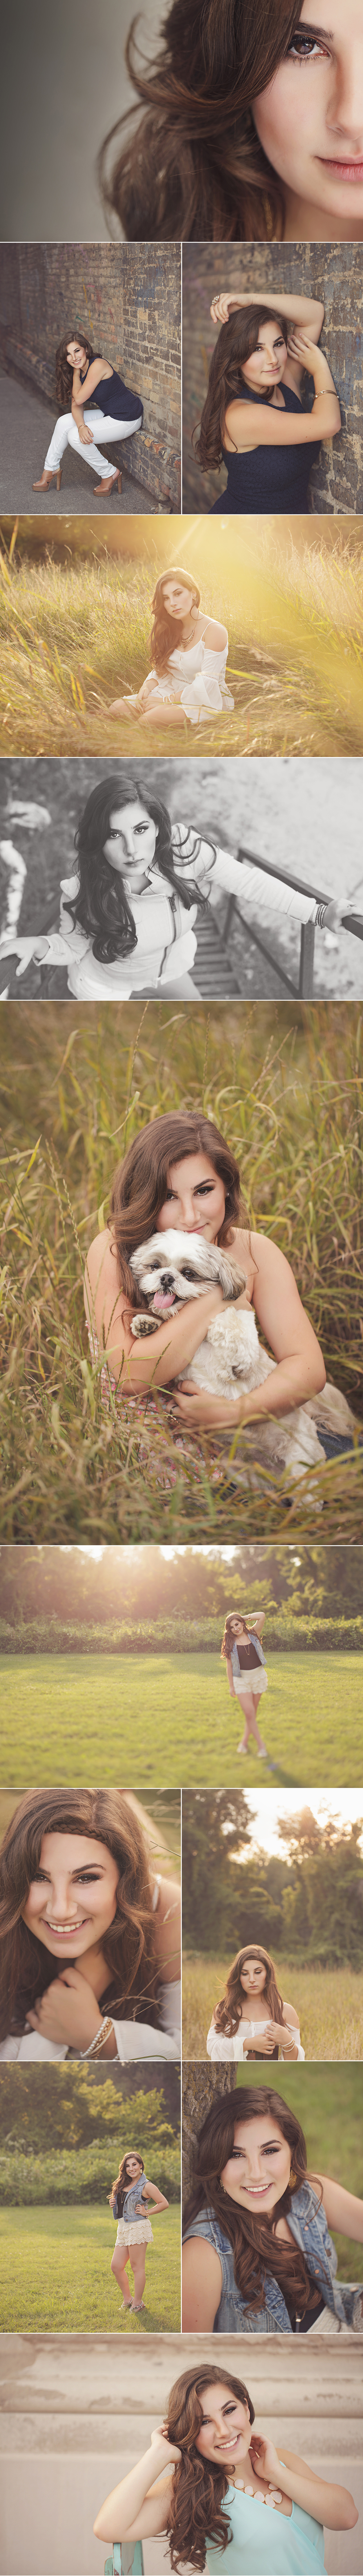 Annie Blog 1